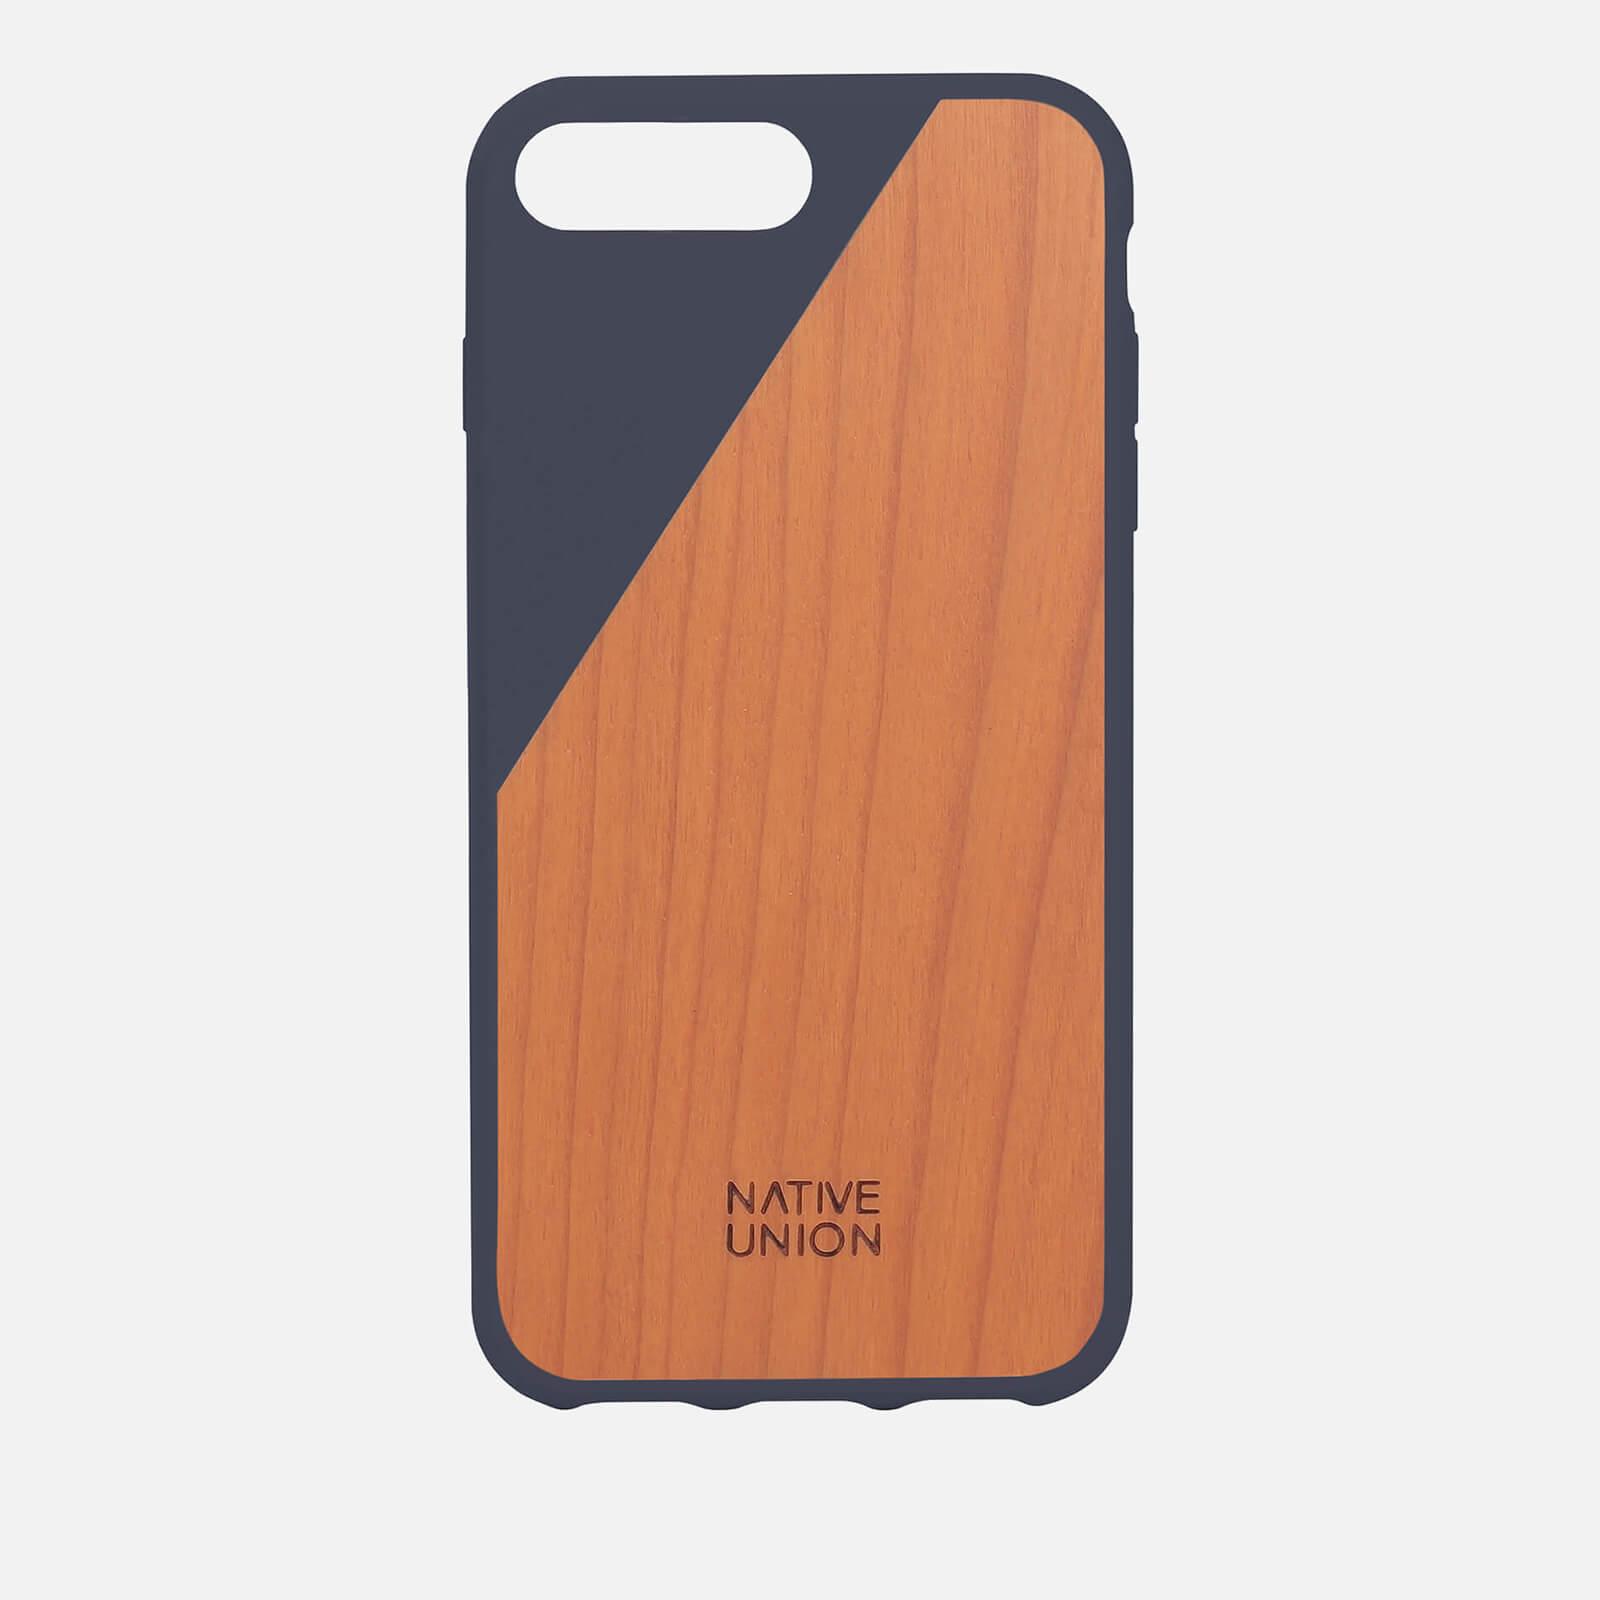 Native Union Clic Wooden iPhone 7 Plus Case - Marine